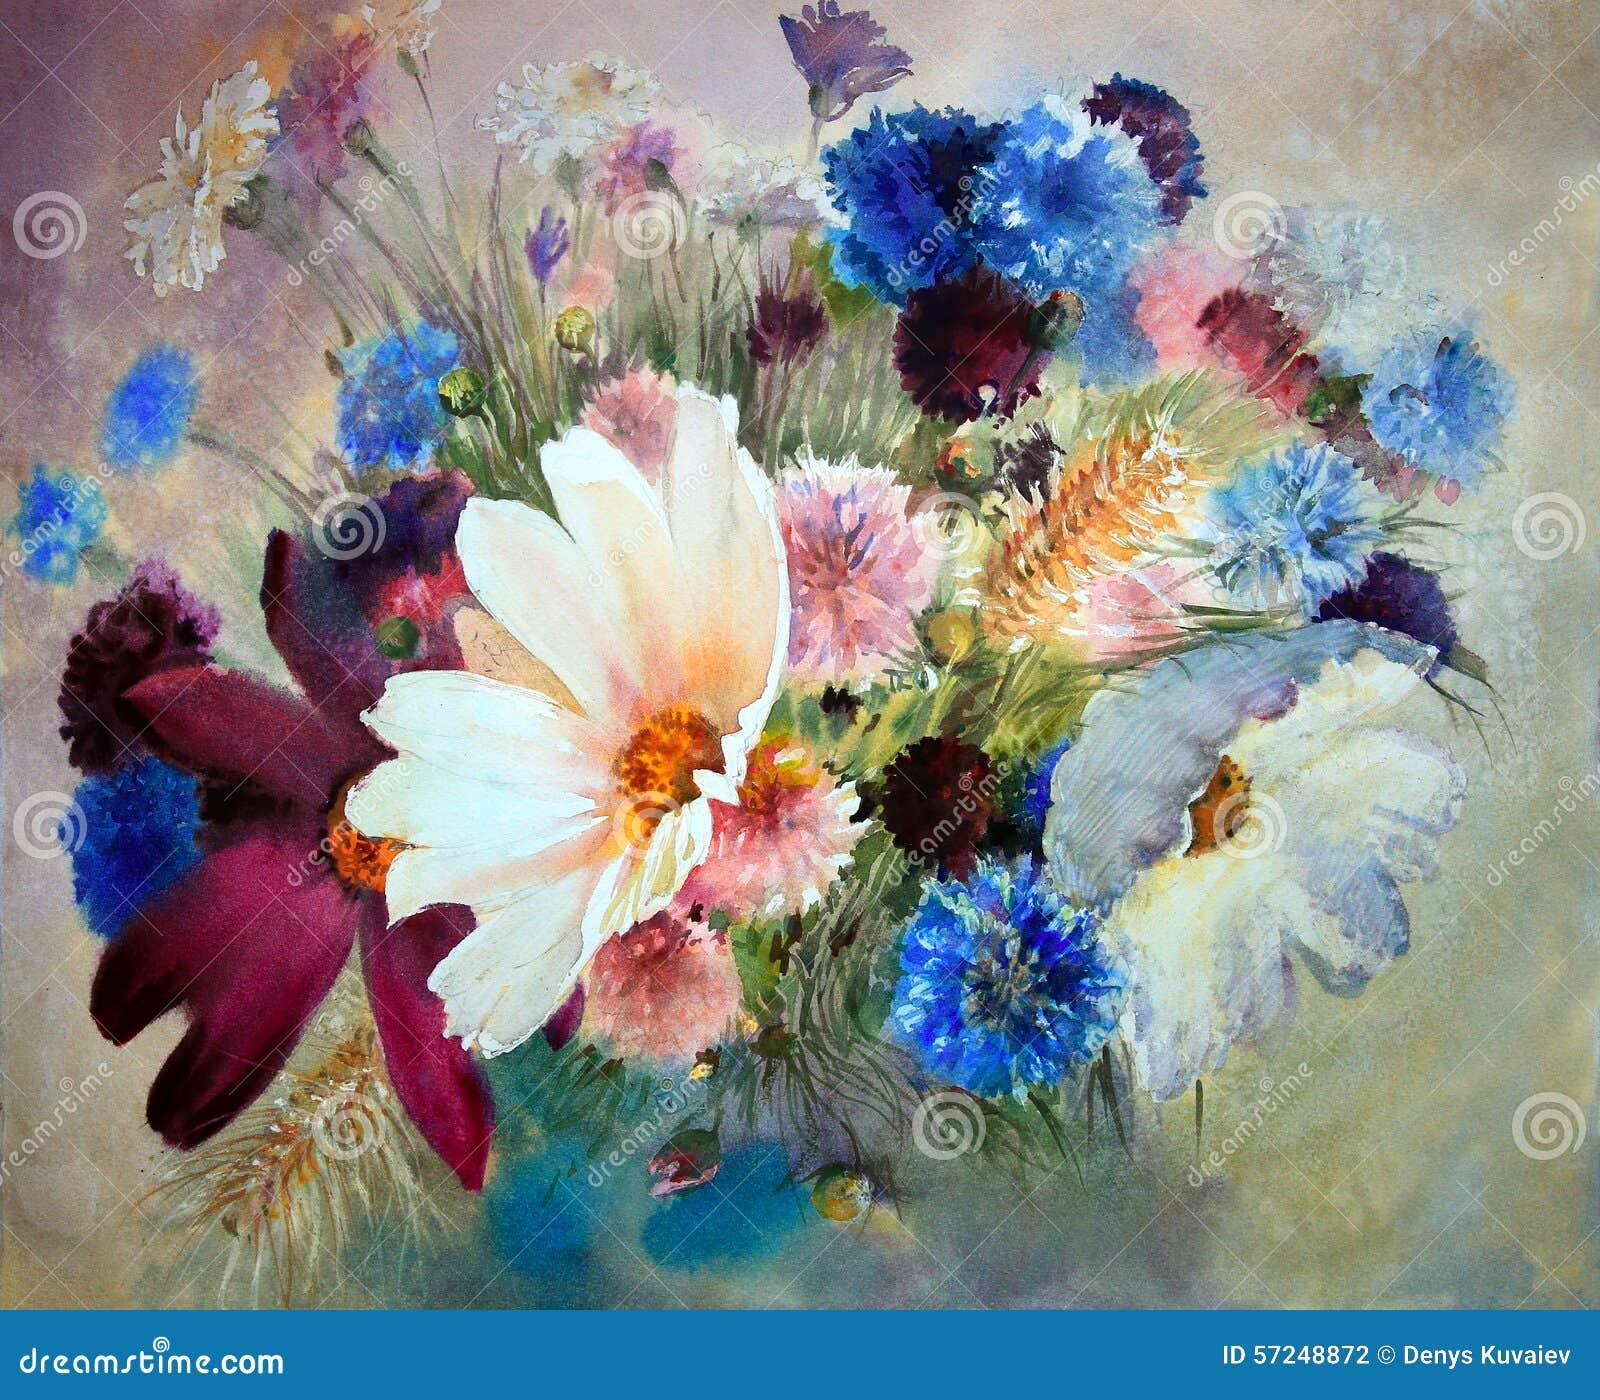 peinture d 39 aquarelle de belles fleurs illustration stock image 57248872. Black Bedroom Furniture Sets. Home Design Ideas